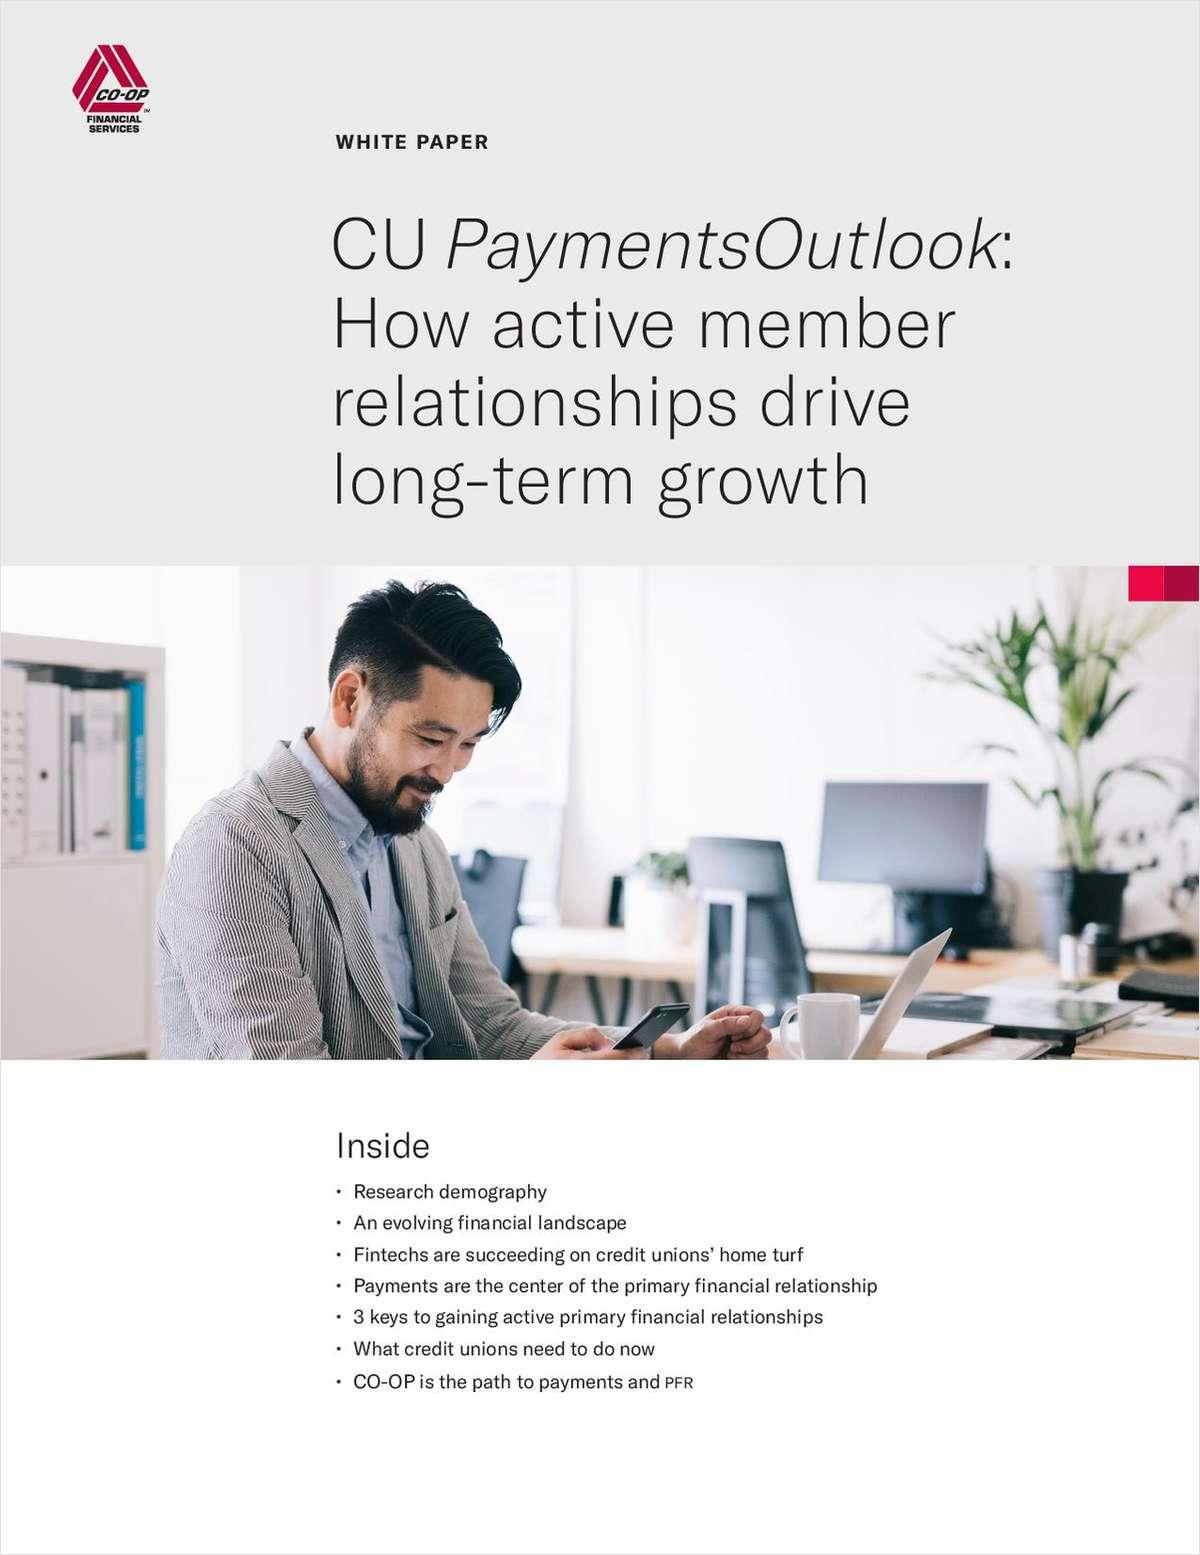 CU PaymentsOutlook: How Active Member Relationships Drive Long-Term Growth